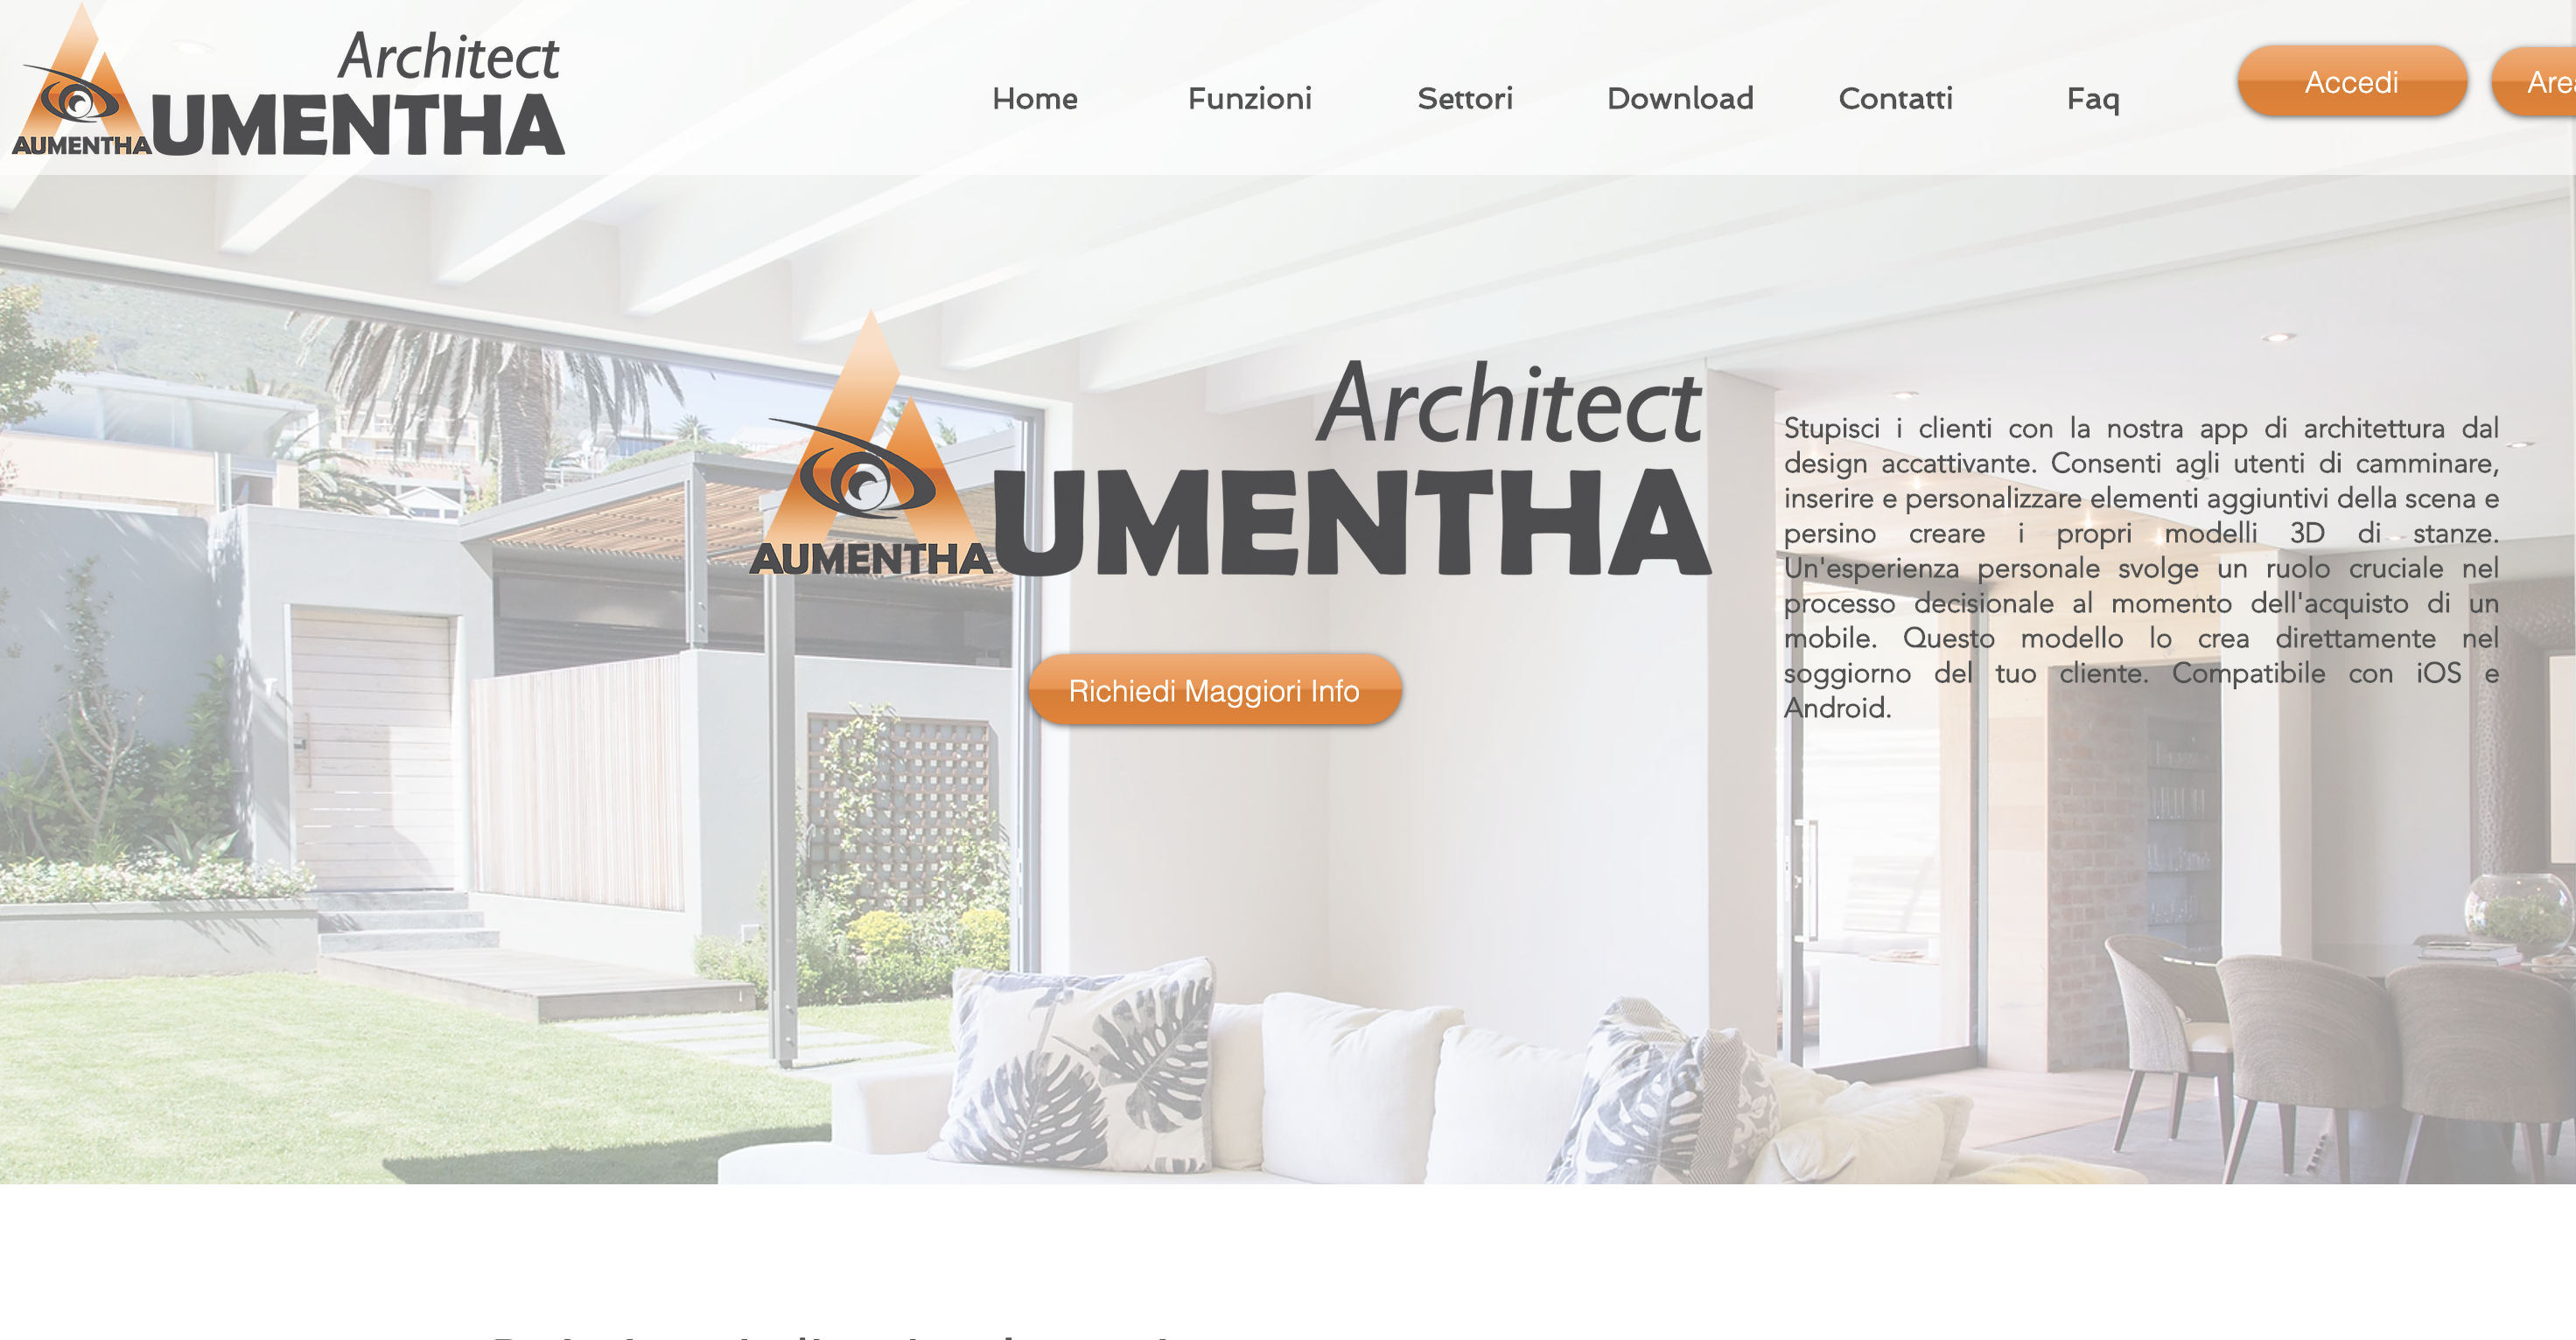 Aumentha architect